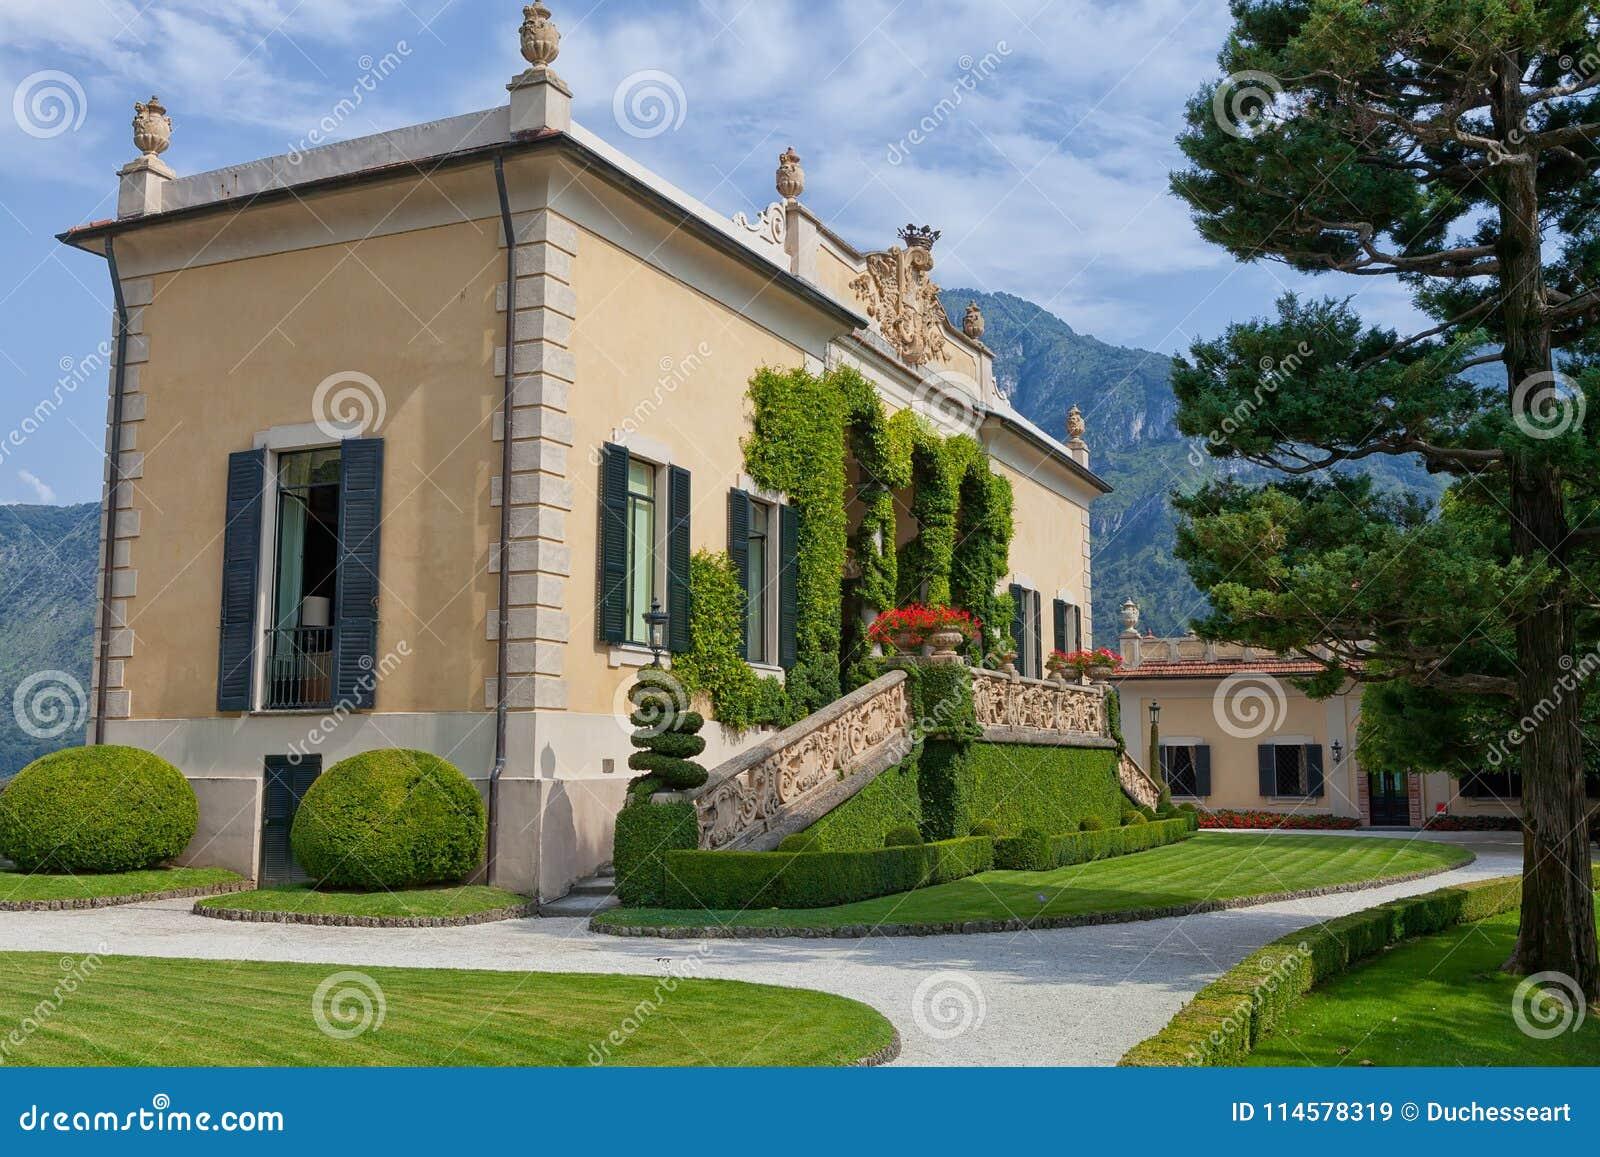 Villa在科莫湖,伦诺, Lombardia,意大利的del Balbianello